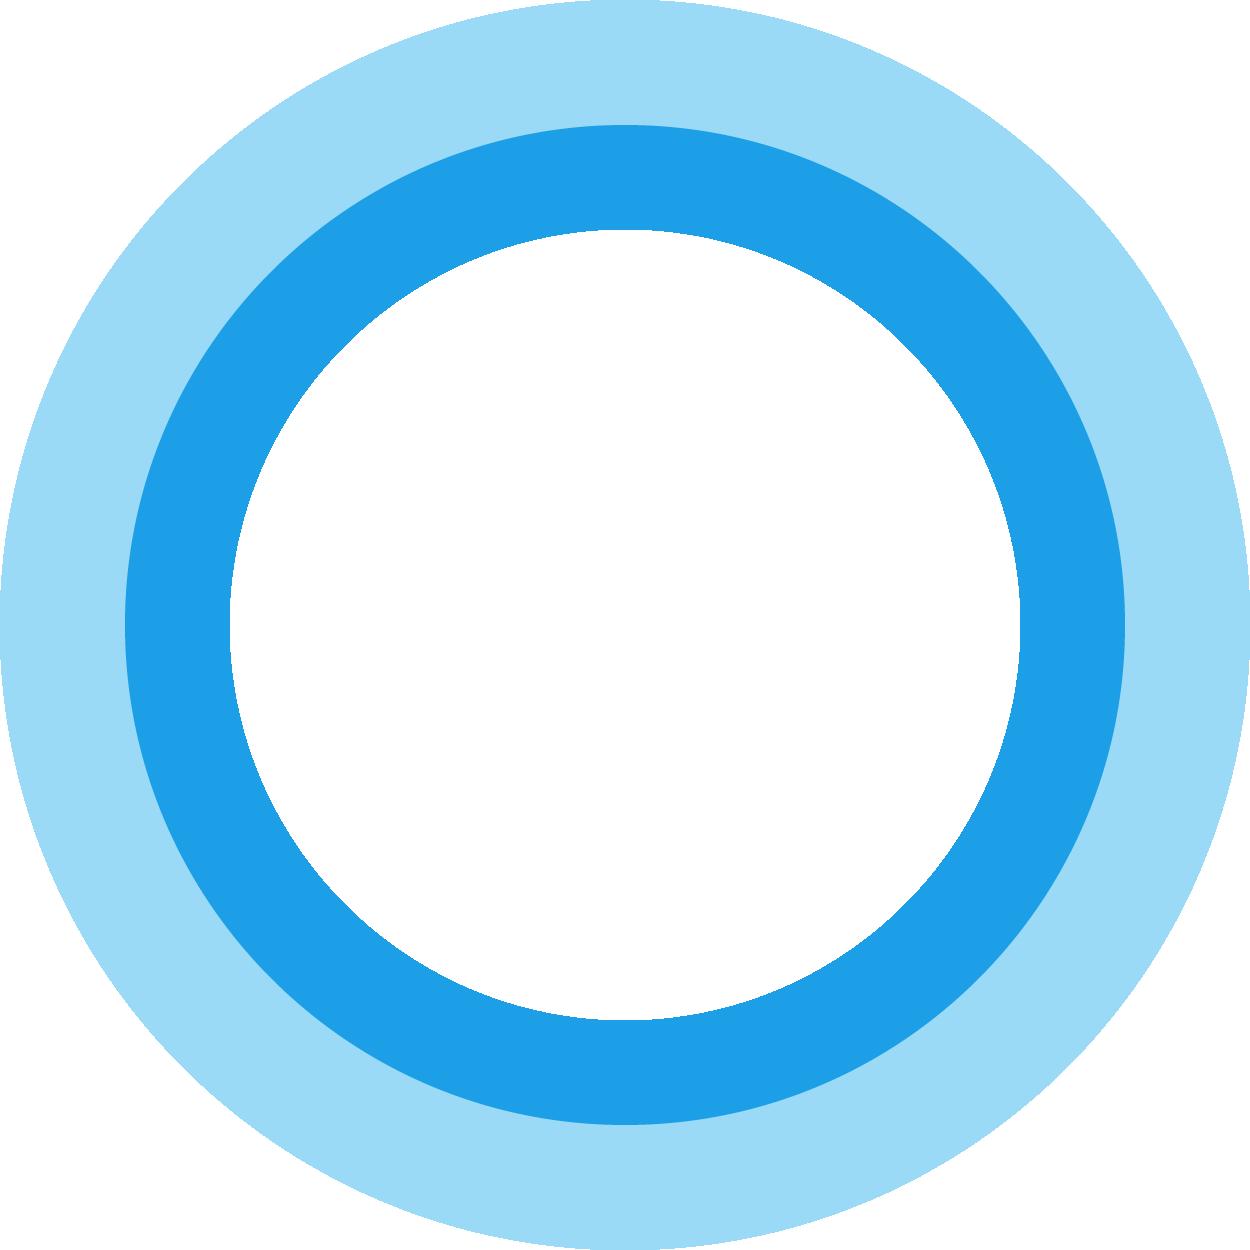 Cortana Logo png